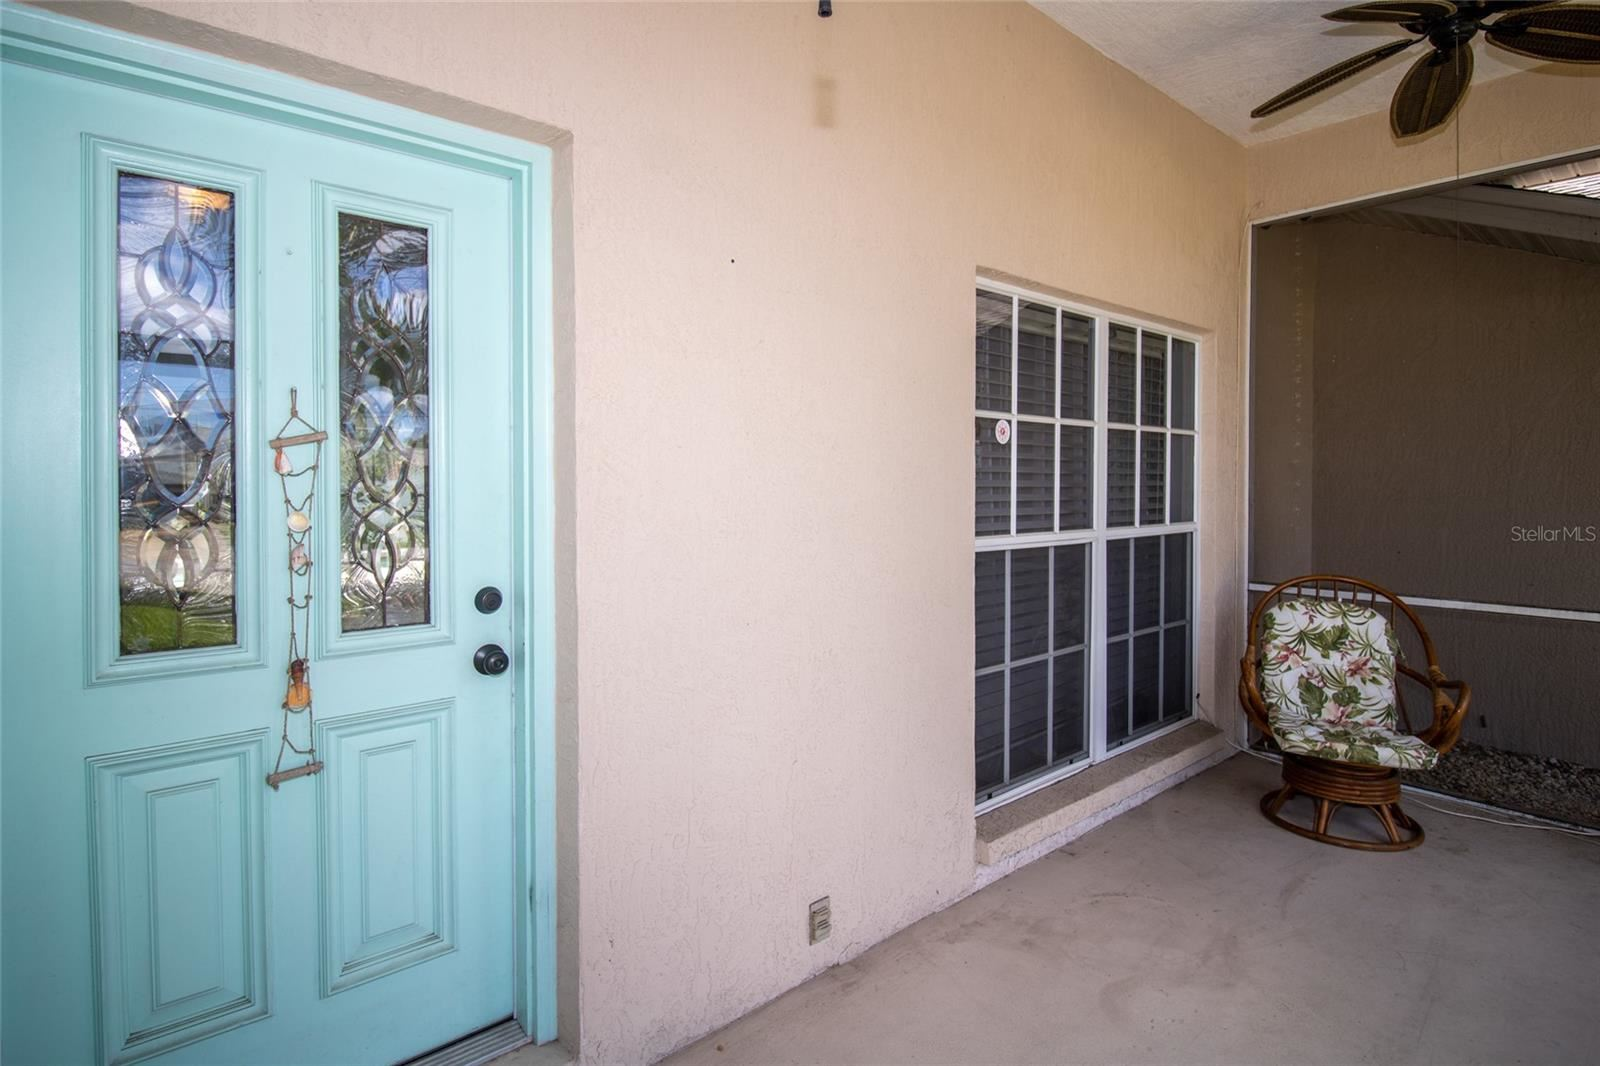 Photo of 11050 GREENWAY AVENUE, ENGLEWOOD, FL 34224 (MLS # D6120274)